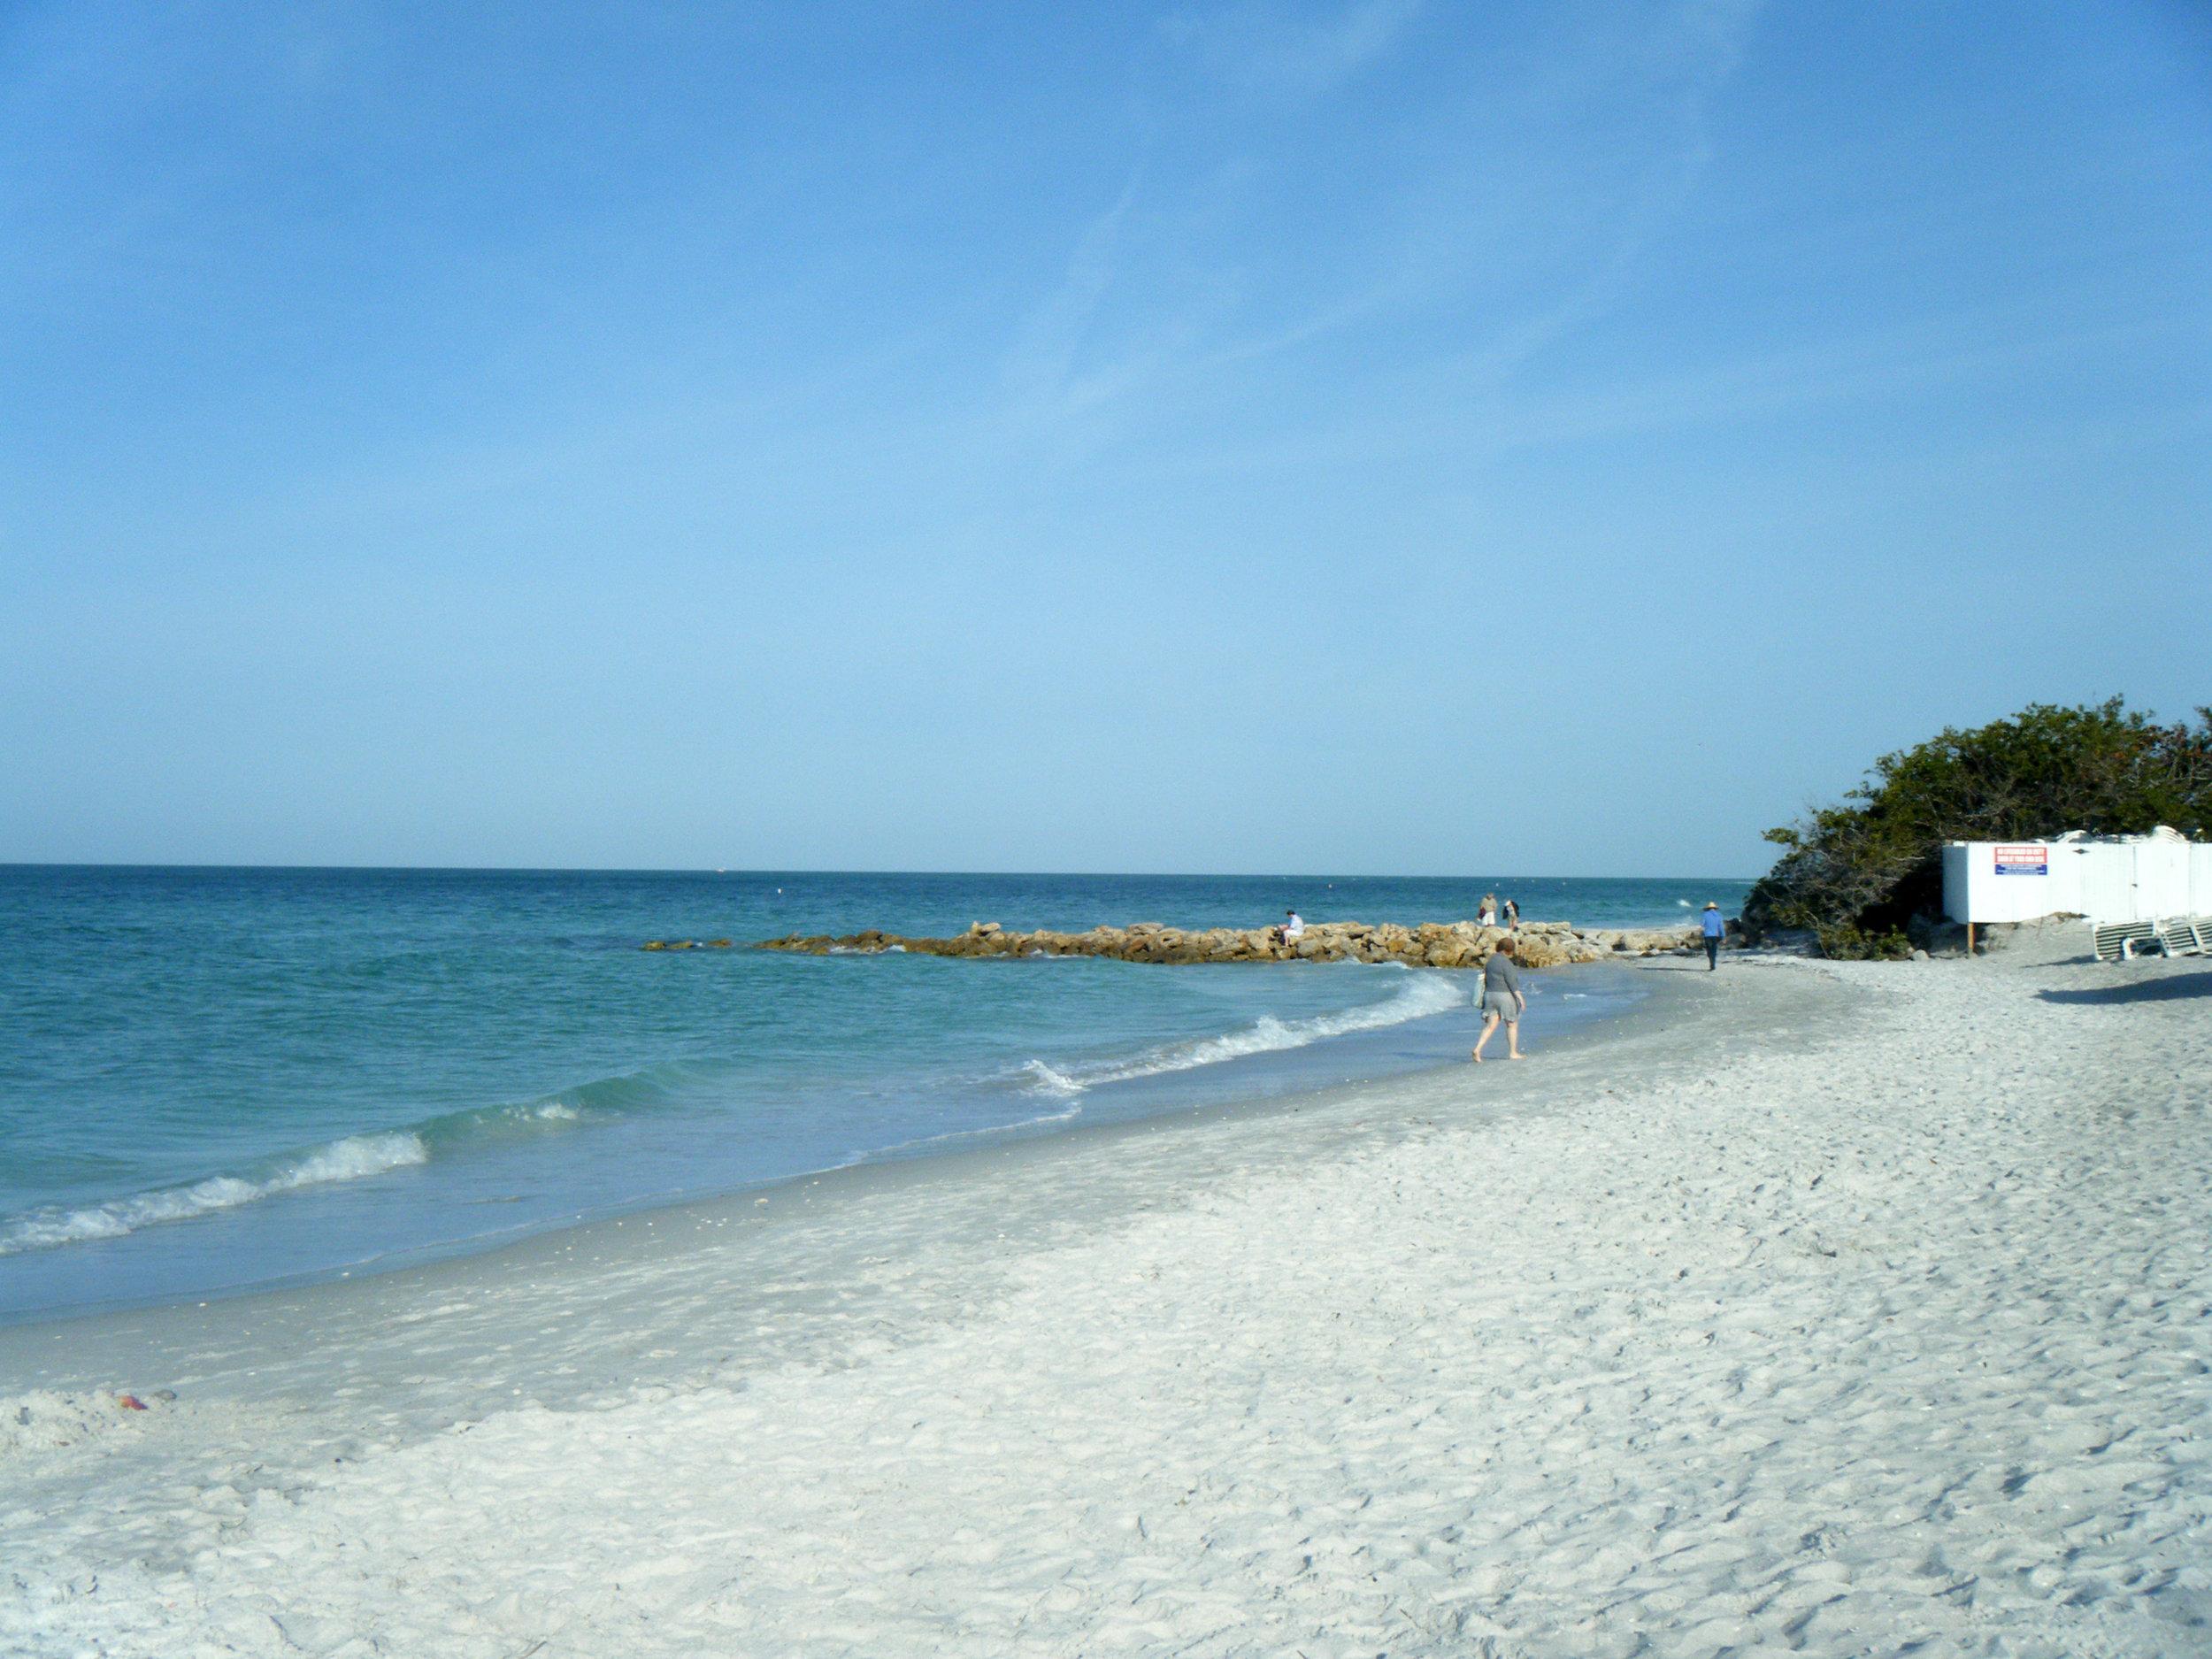 Gulf of Mexico.jpg